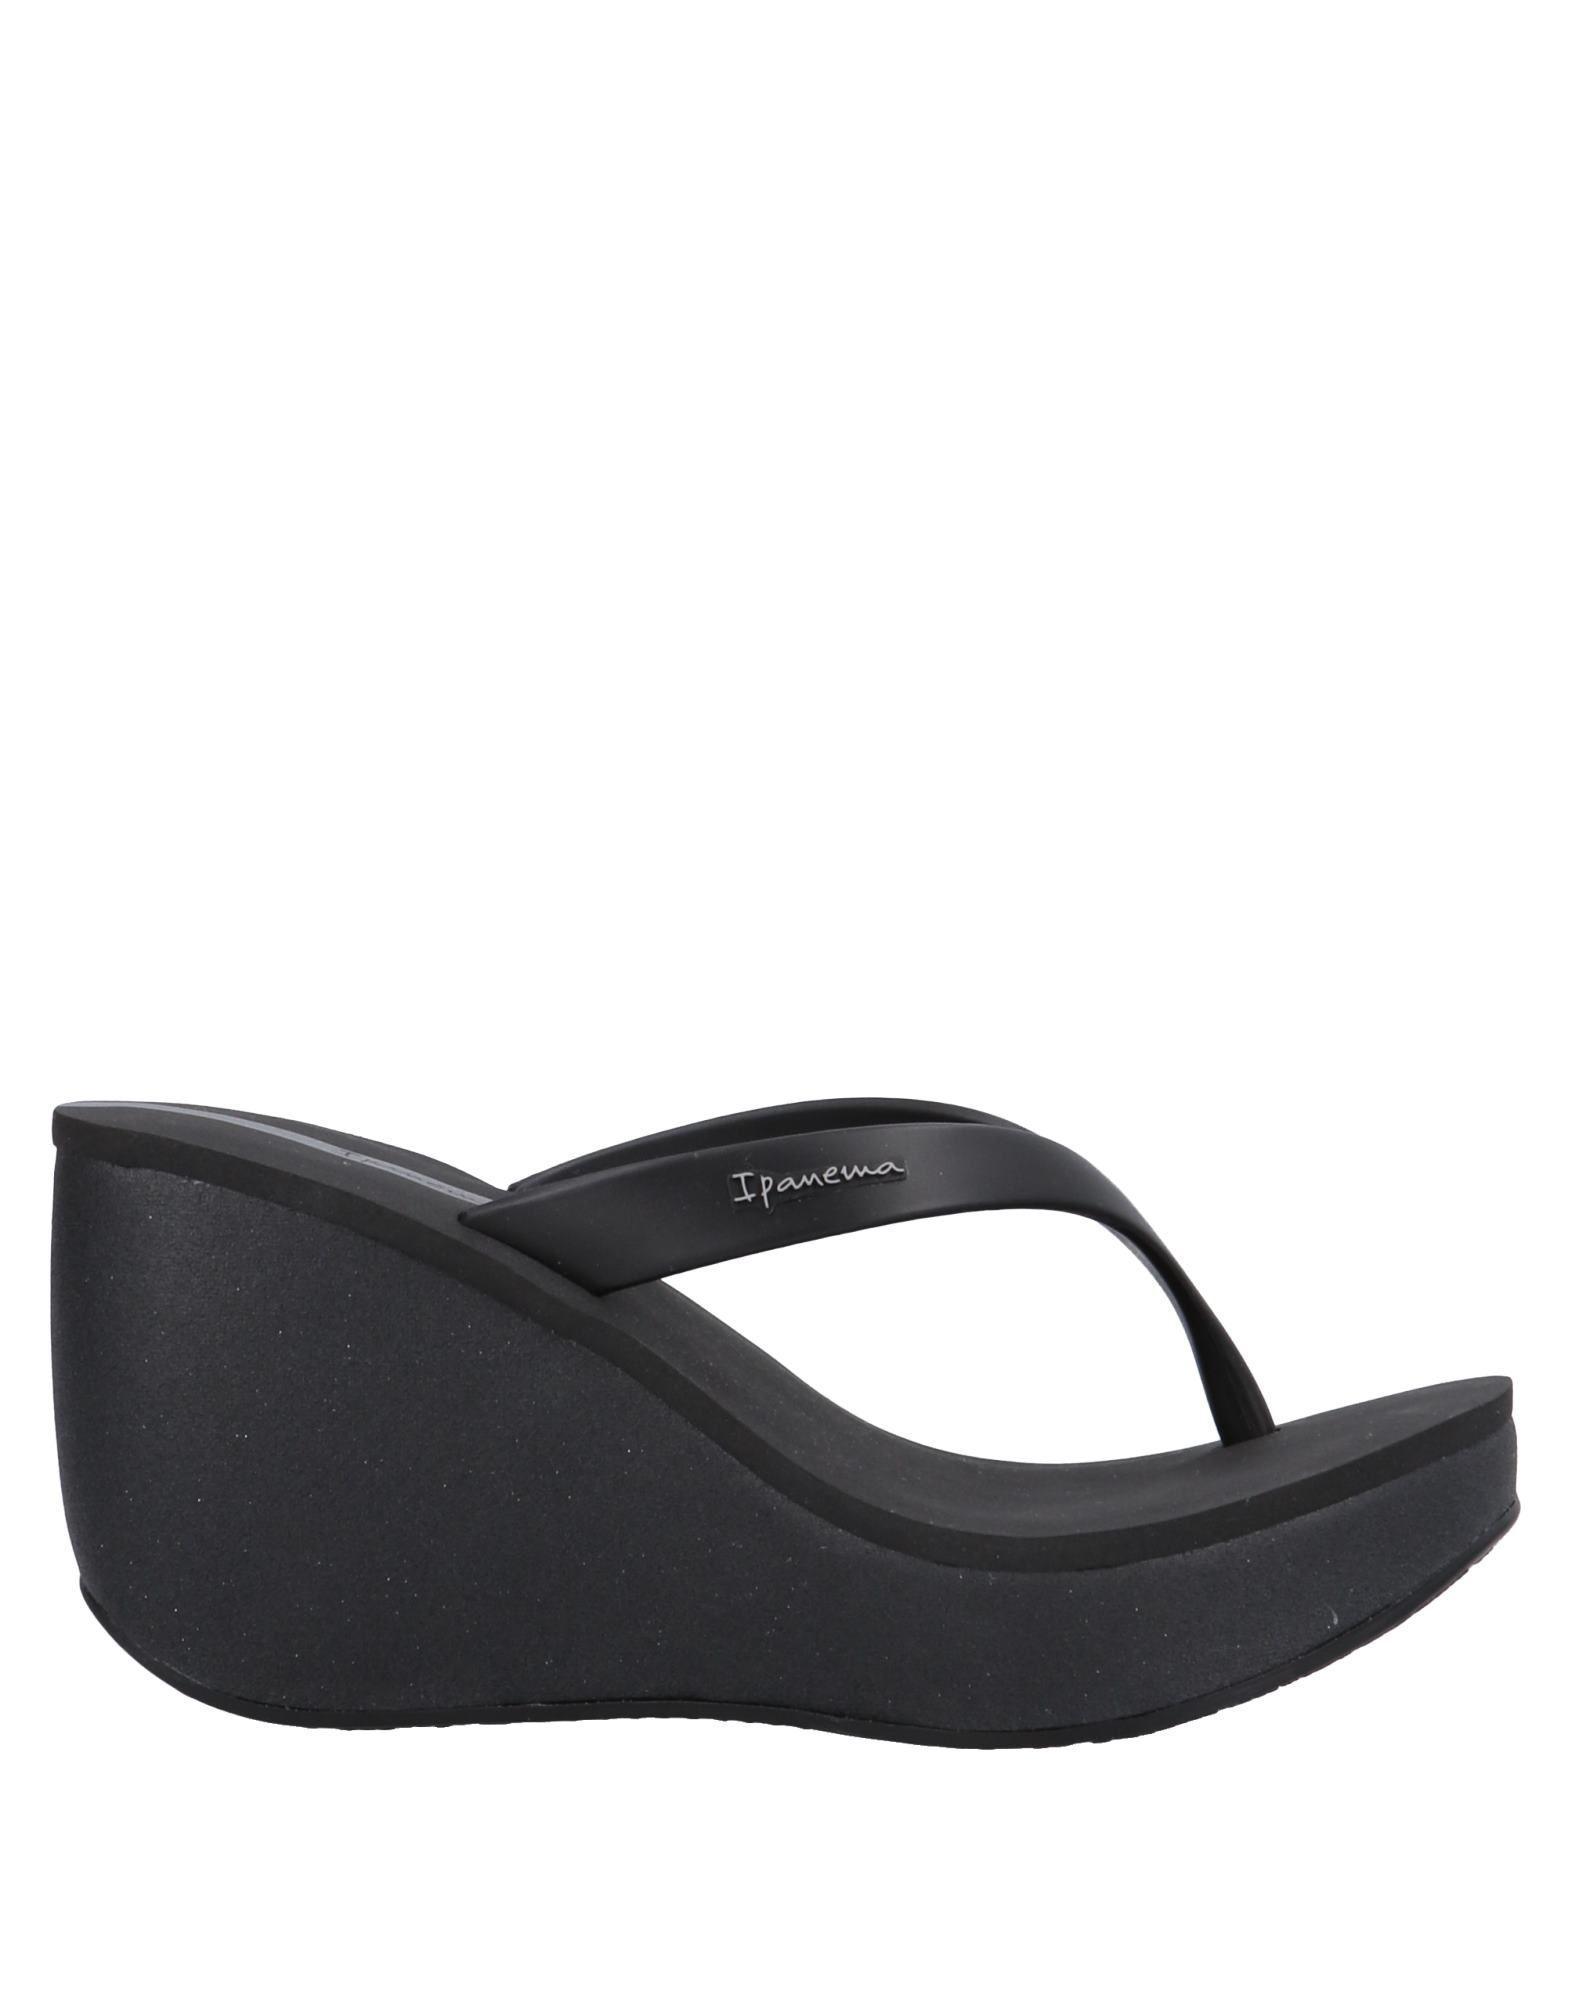 3d71e6a1f731 Lyst - Ipanema Toe Post Sandal in Black - Save 27%